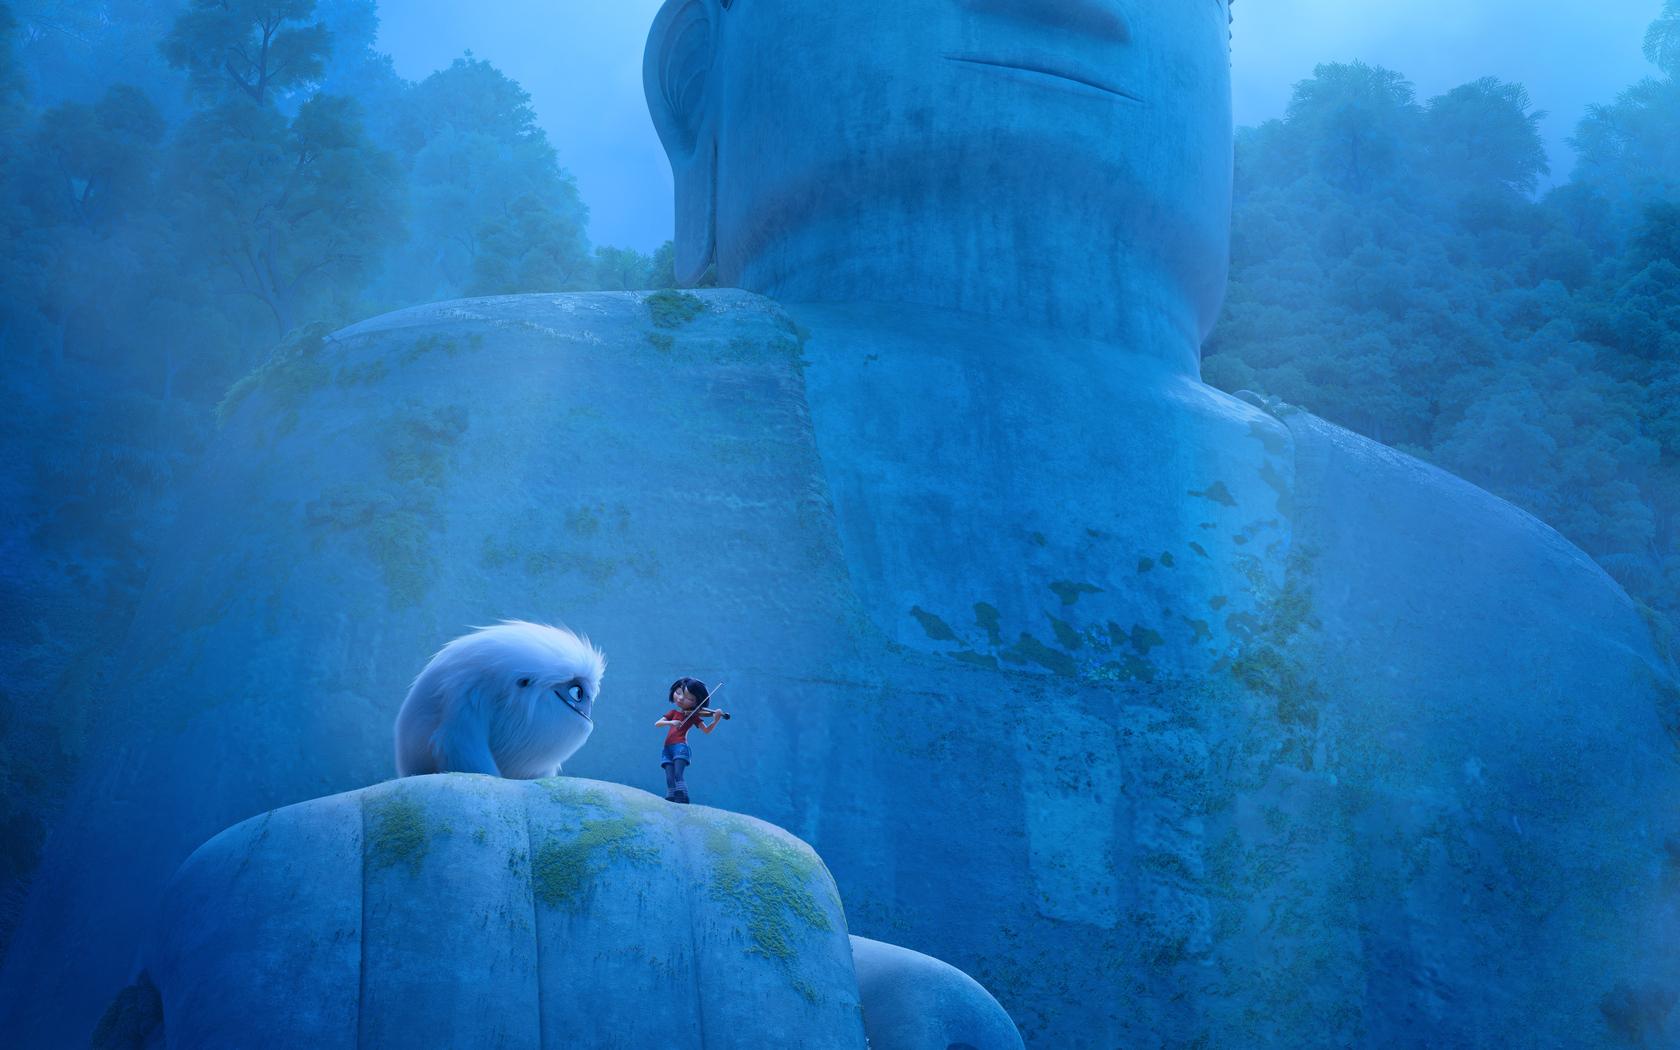 abominable-movie-2019-pm.jpg